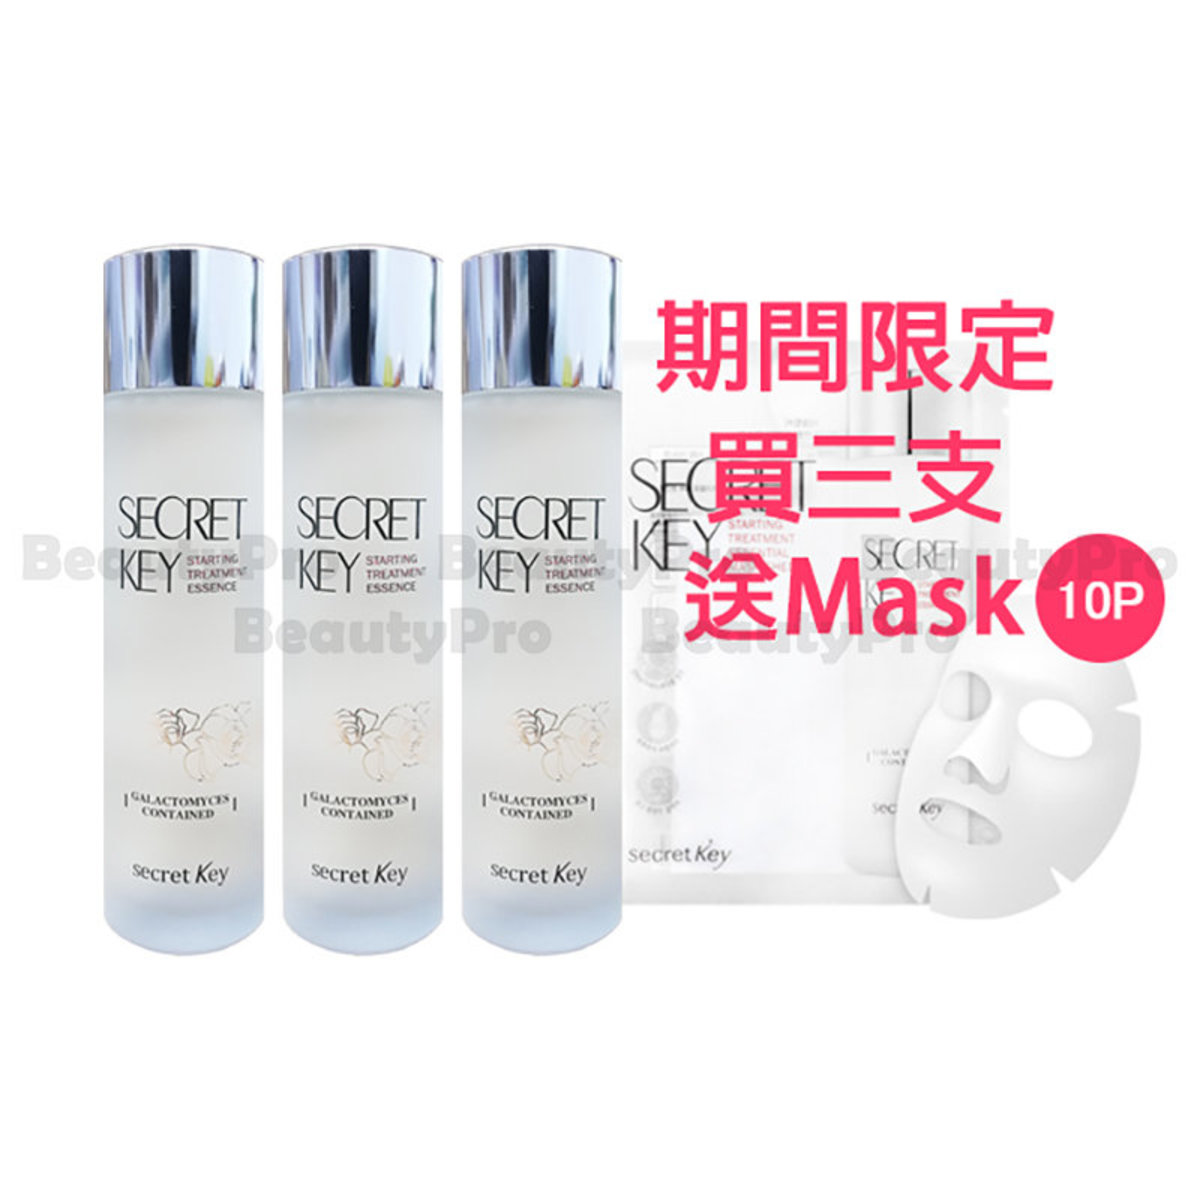 【Dealer Goods】Secret Key Starting Treatment Essence 150ml x3 <newest> Buy 3 Get 1 Free Mask